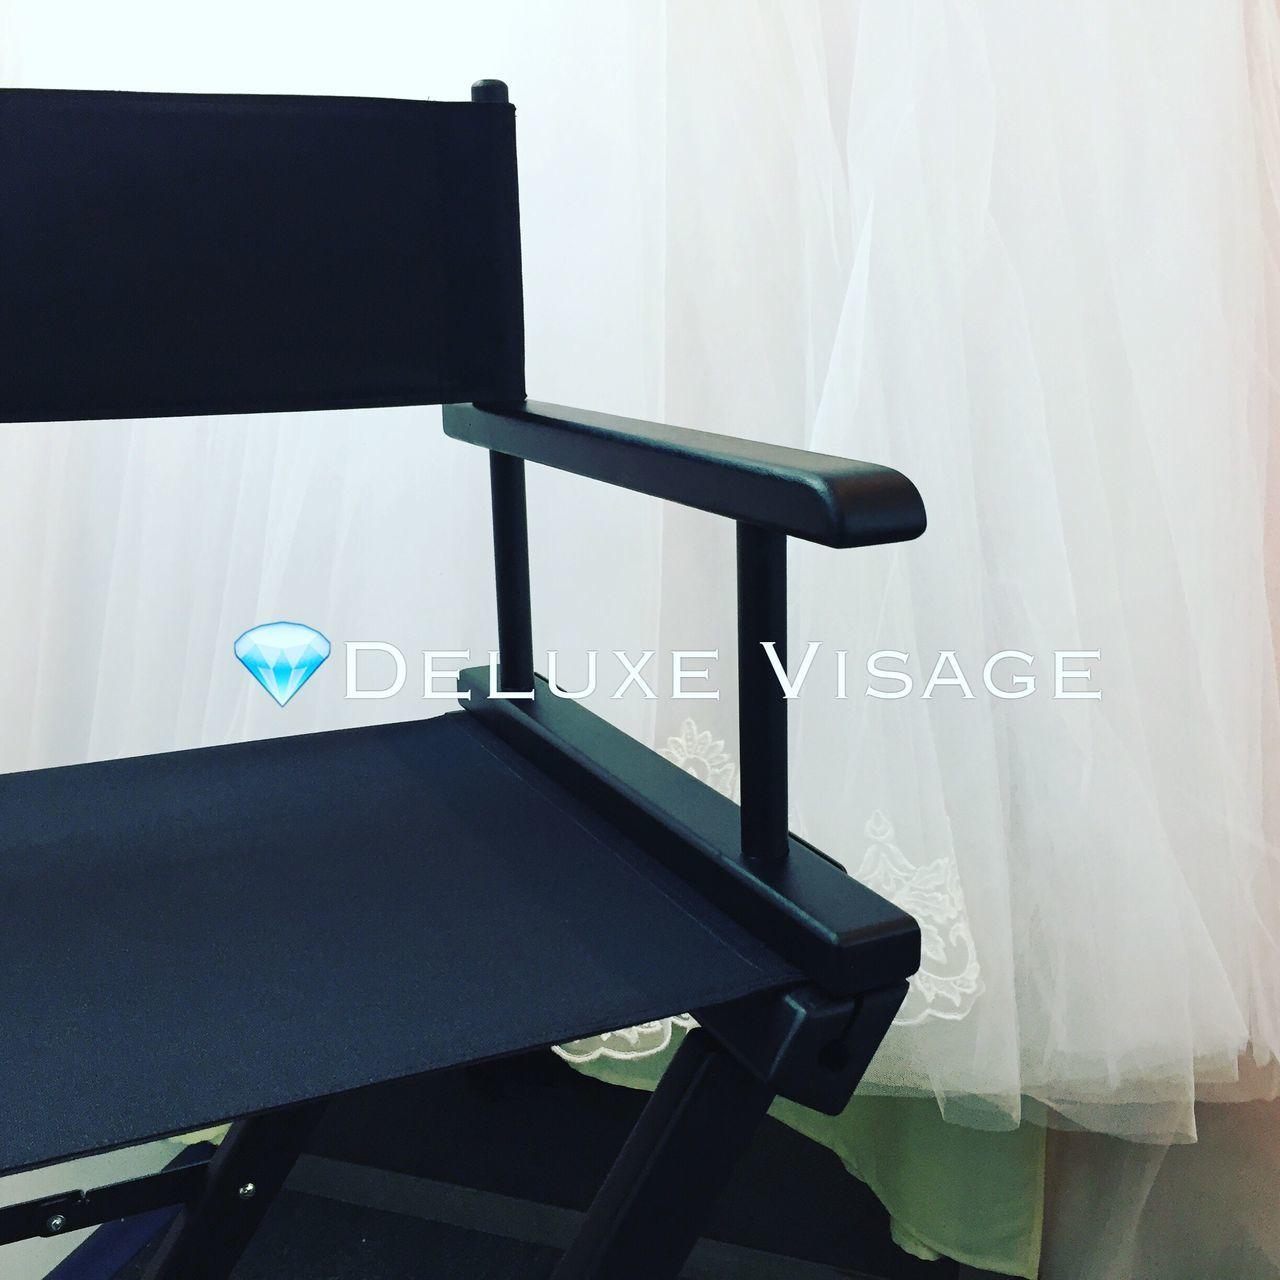 Стул для визажиста стул визажист визажистмосква визаж макияж  макияж глаз макимаки Makeup Makeupartist